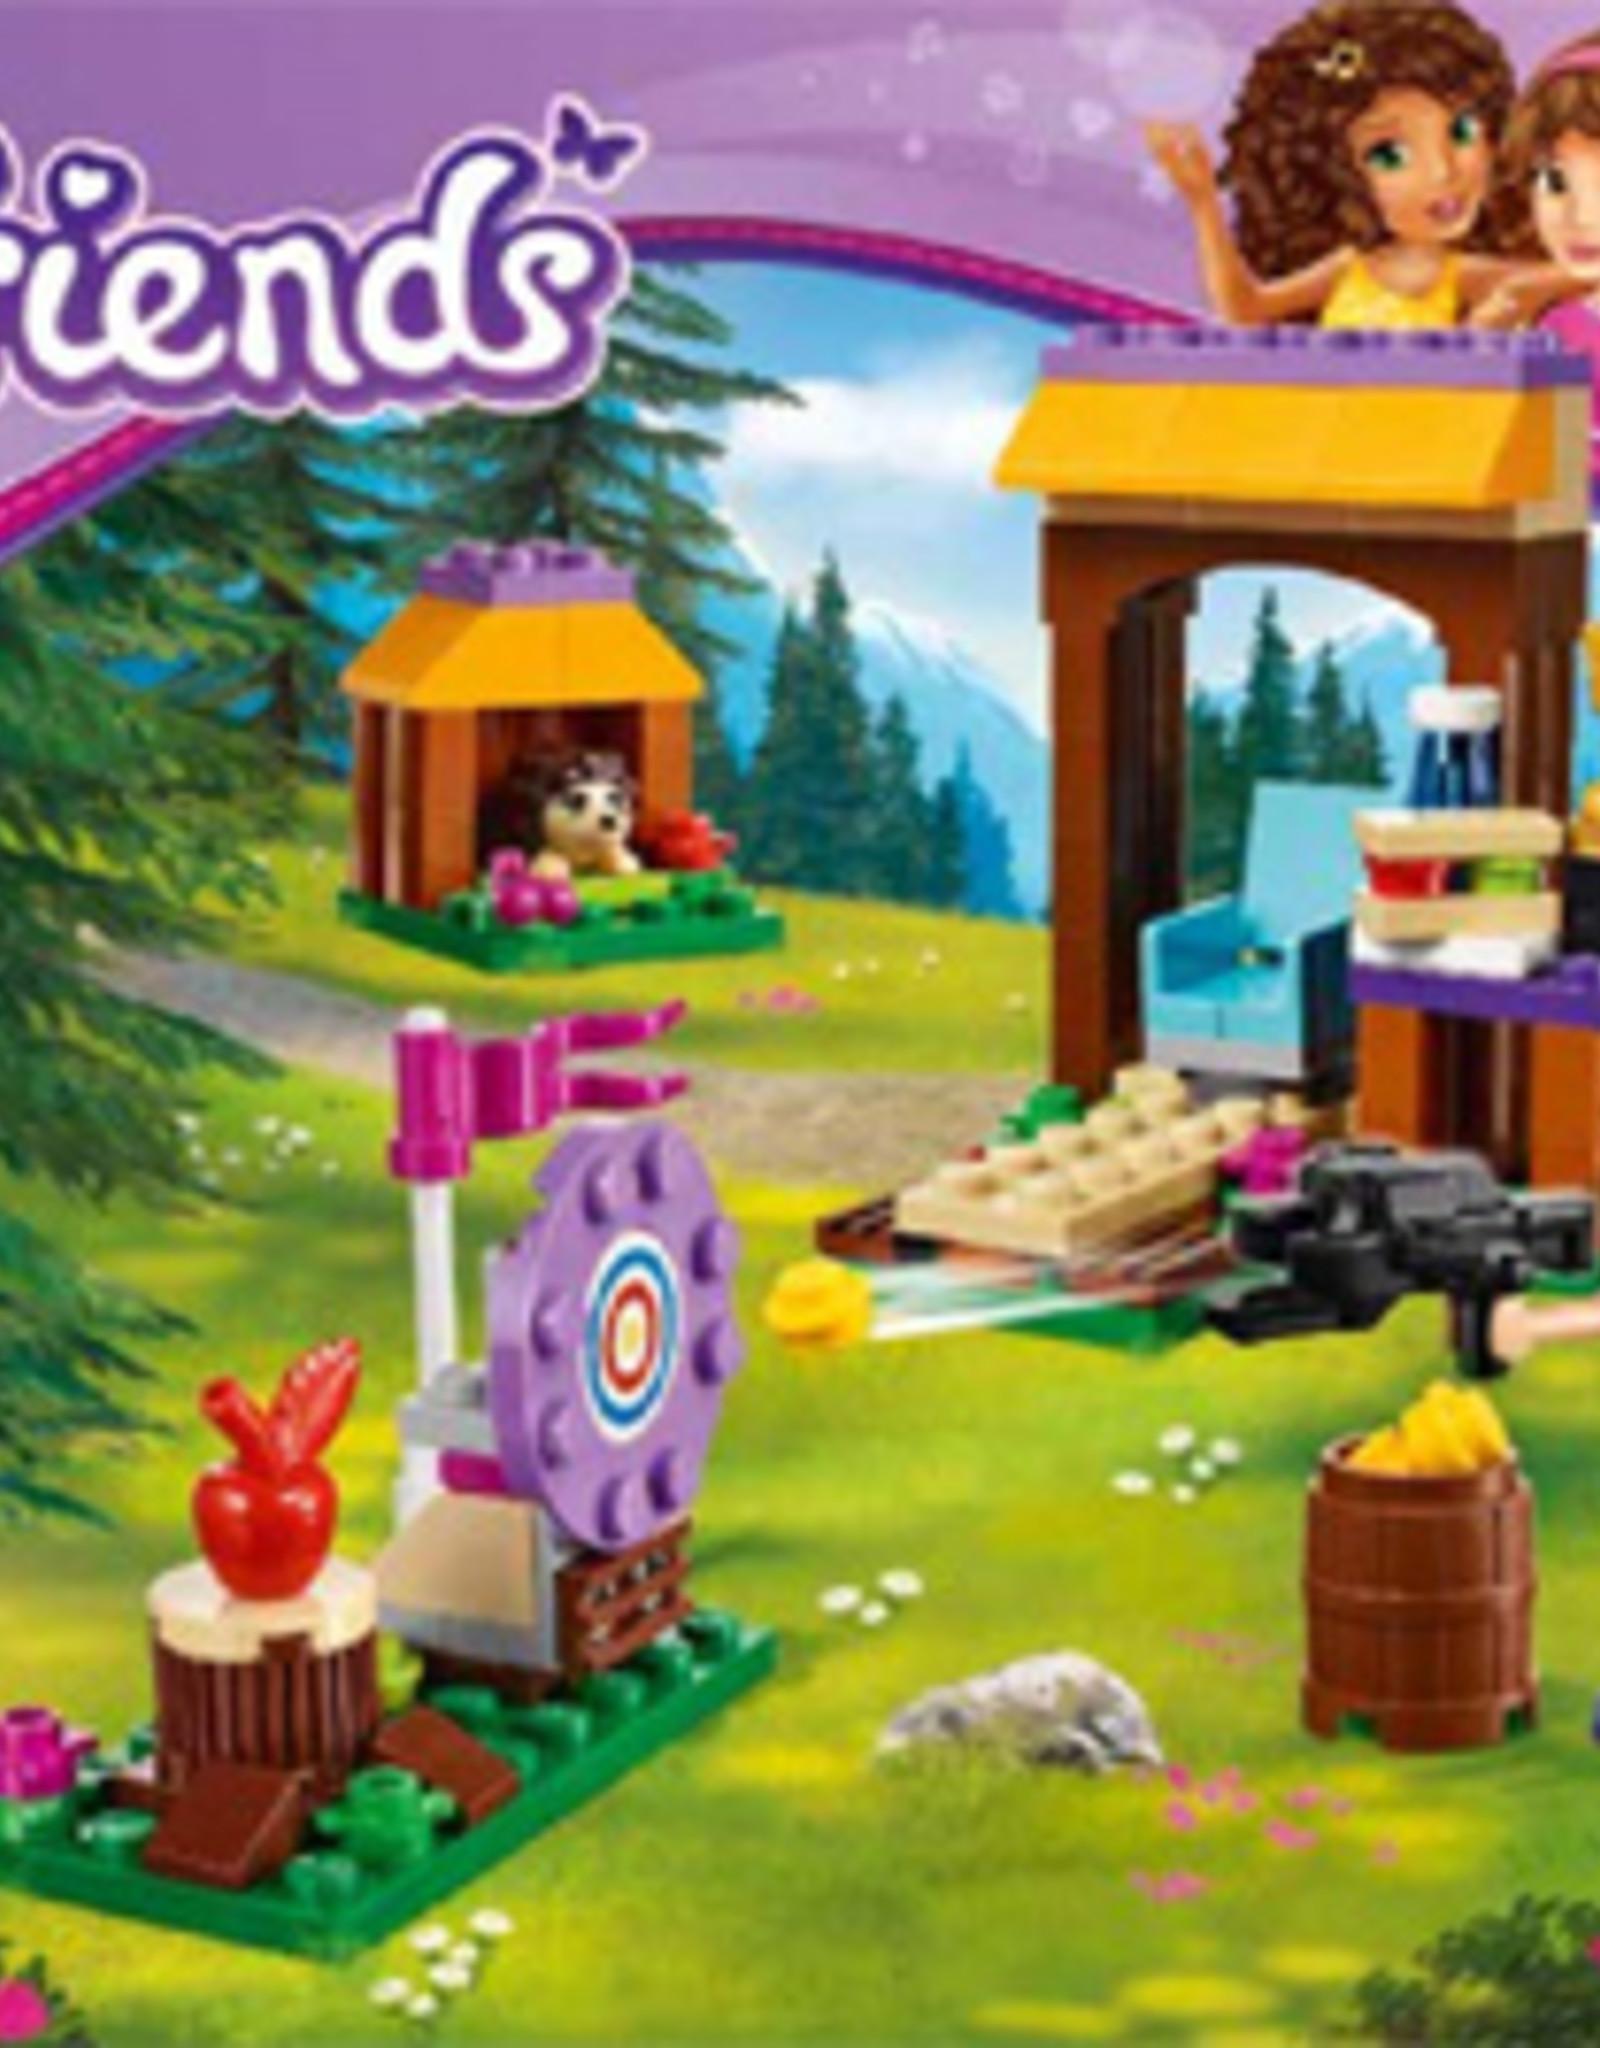 LEGO LEGO 41120 Avontuur boogschieten FRIENDS